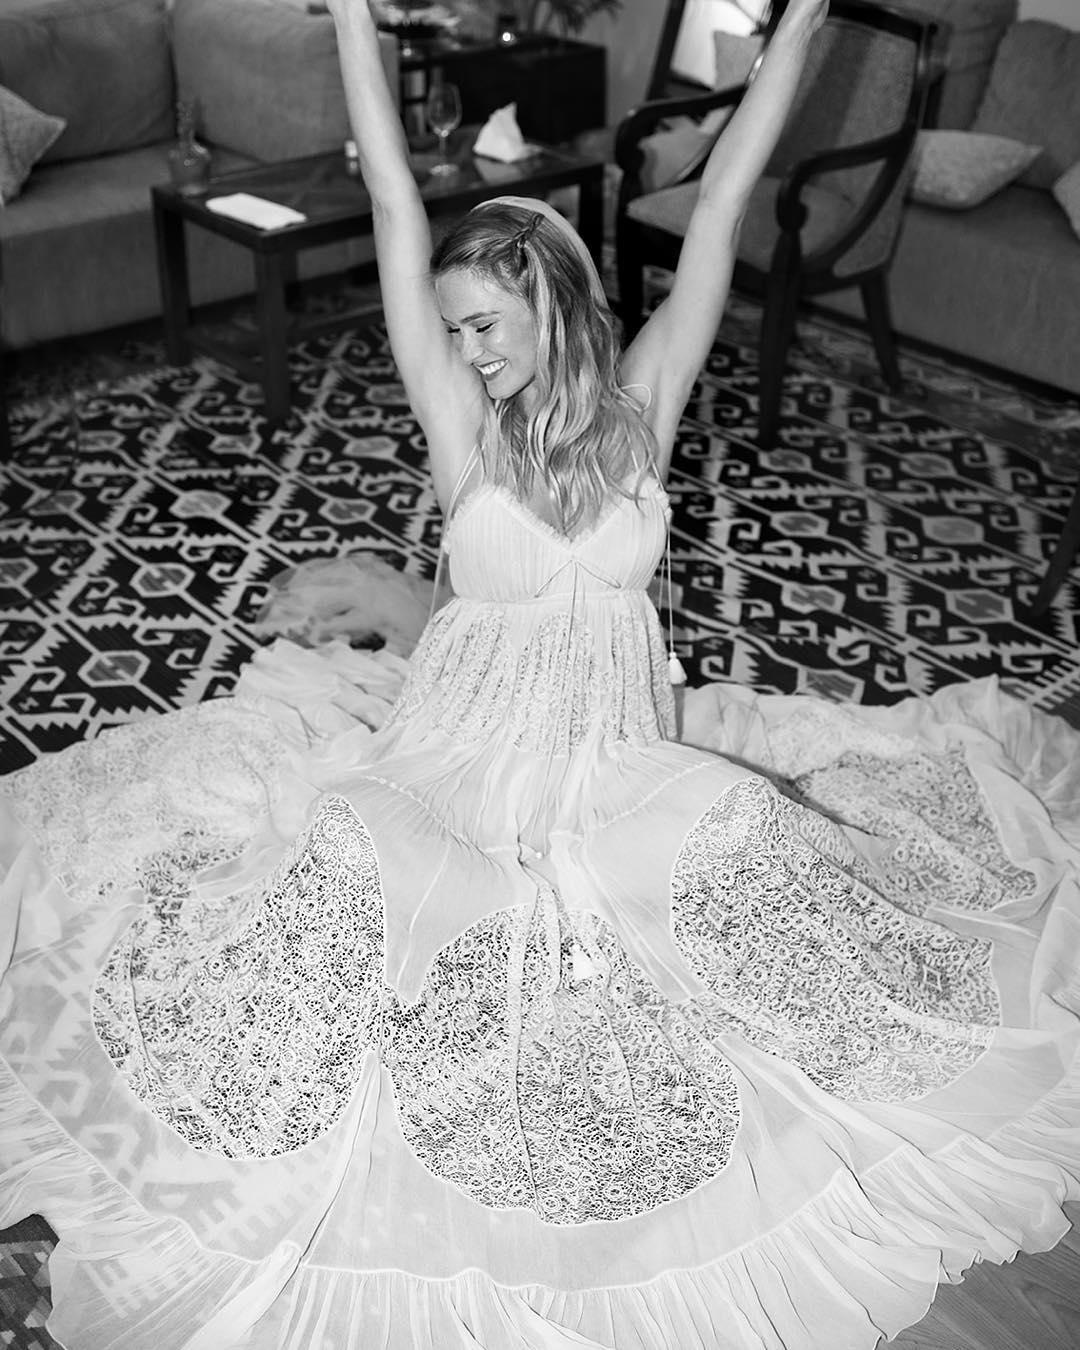 Best celebrity wedding dresses of 2015 weddingsonline barrefaeliweddingdresscelebrityboho bar refaeli in chloe ombrellifo Image collections